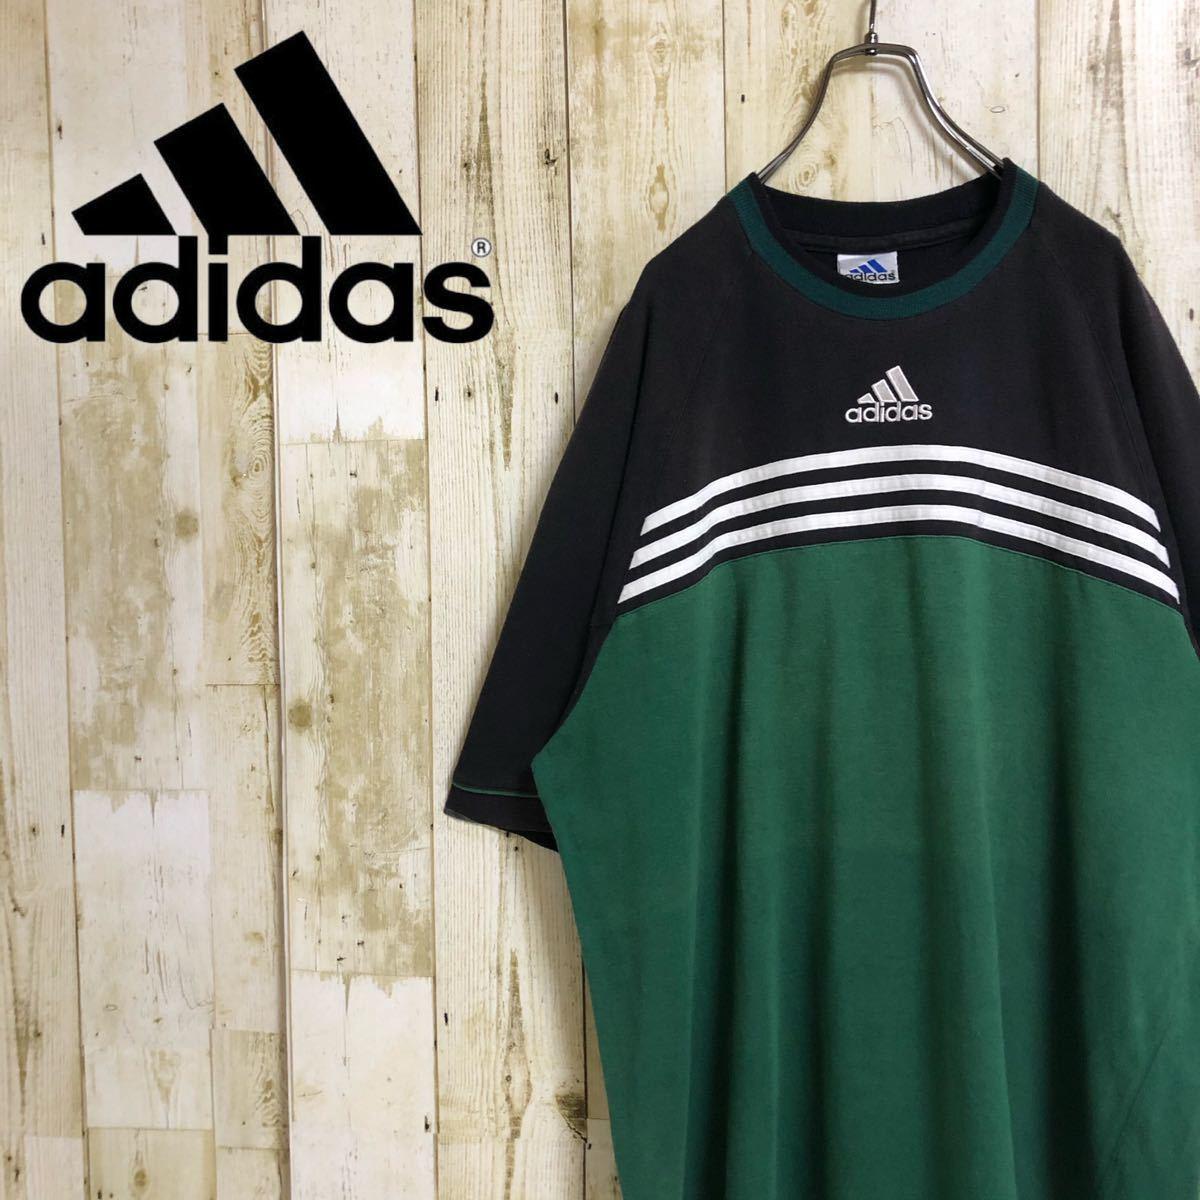 adidas センターロゴ 刺繍ロゴ パフォーマンスロゴ スリーストライプ スリーライン 切替 ビッグサイズ ユニセックス 半袖Tシャツ 2XL 古着